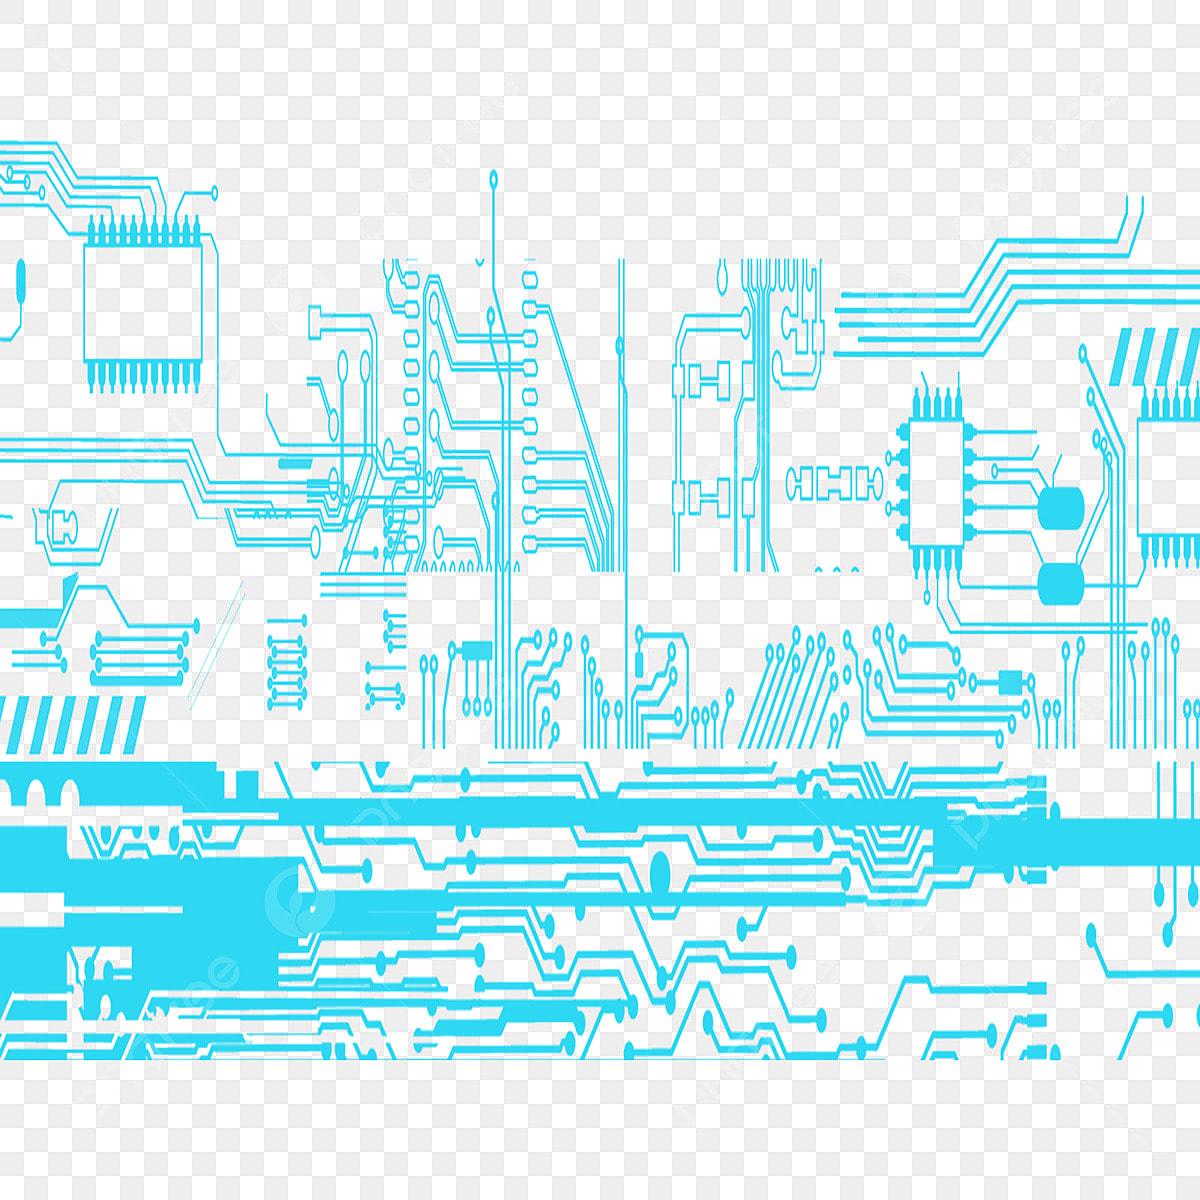 side vector circboard wiring diagram circuit board background  circuit vector  green  circuit board png  circuit board background  circuit